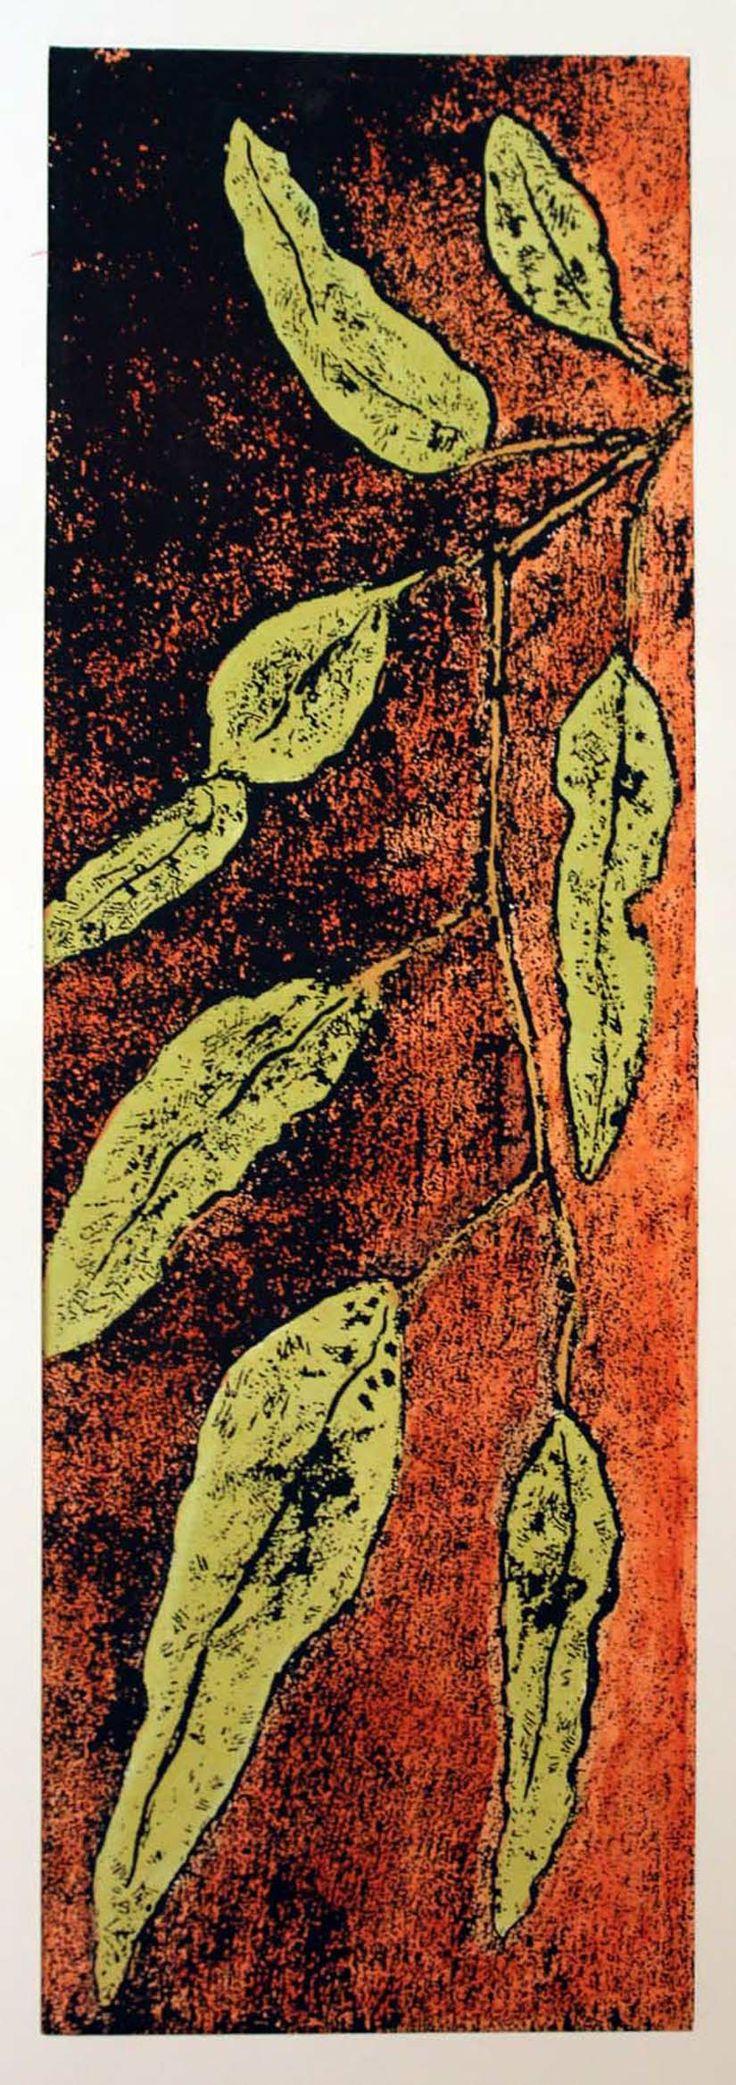 Gum Leaves Hand Colored Etching PrintmakingEtchings